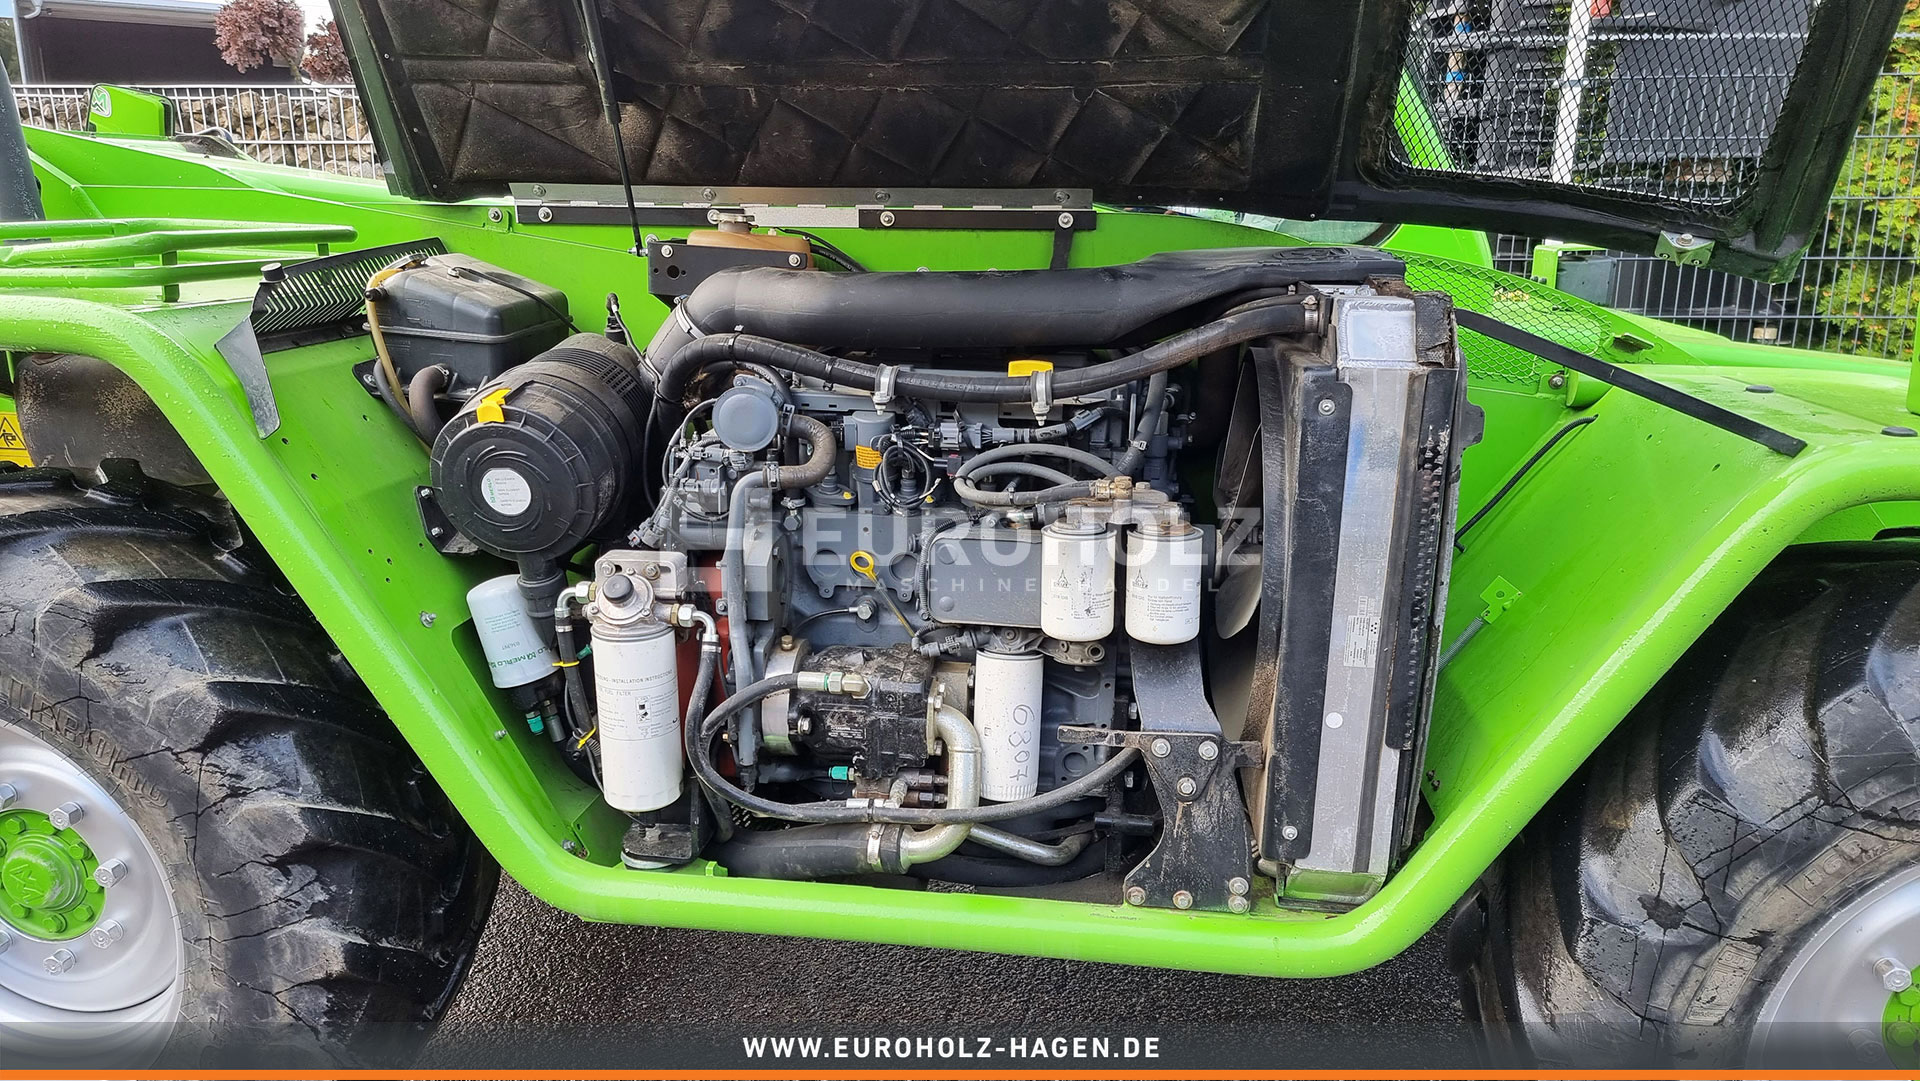 Radlader MERLO P 34.7 Turbo 4x4 Allrad 40 km/h